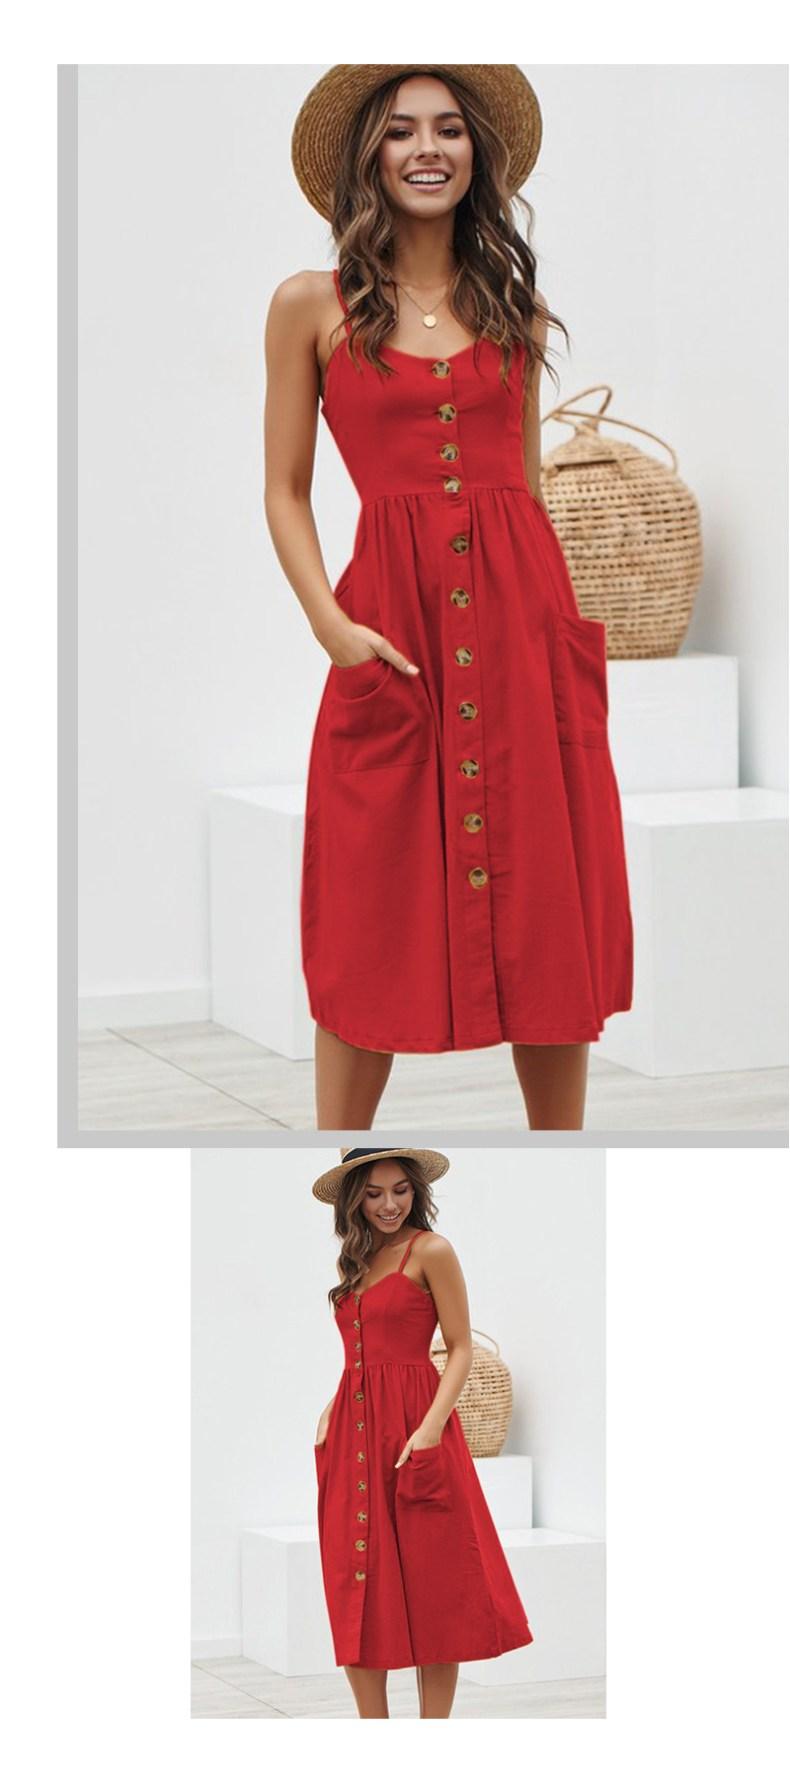 10648434635 1685006654 Women Summer Dress 2019 Boho Sexy Spaghetti Straps Floral Beach Dress With Pocket Midi Button Backless Sundress Female Vestidos